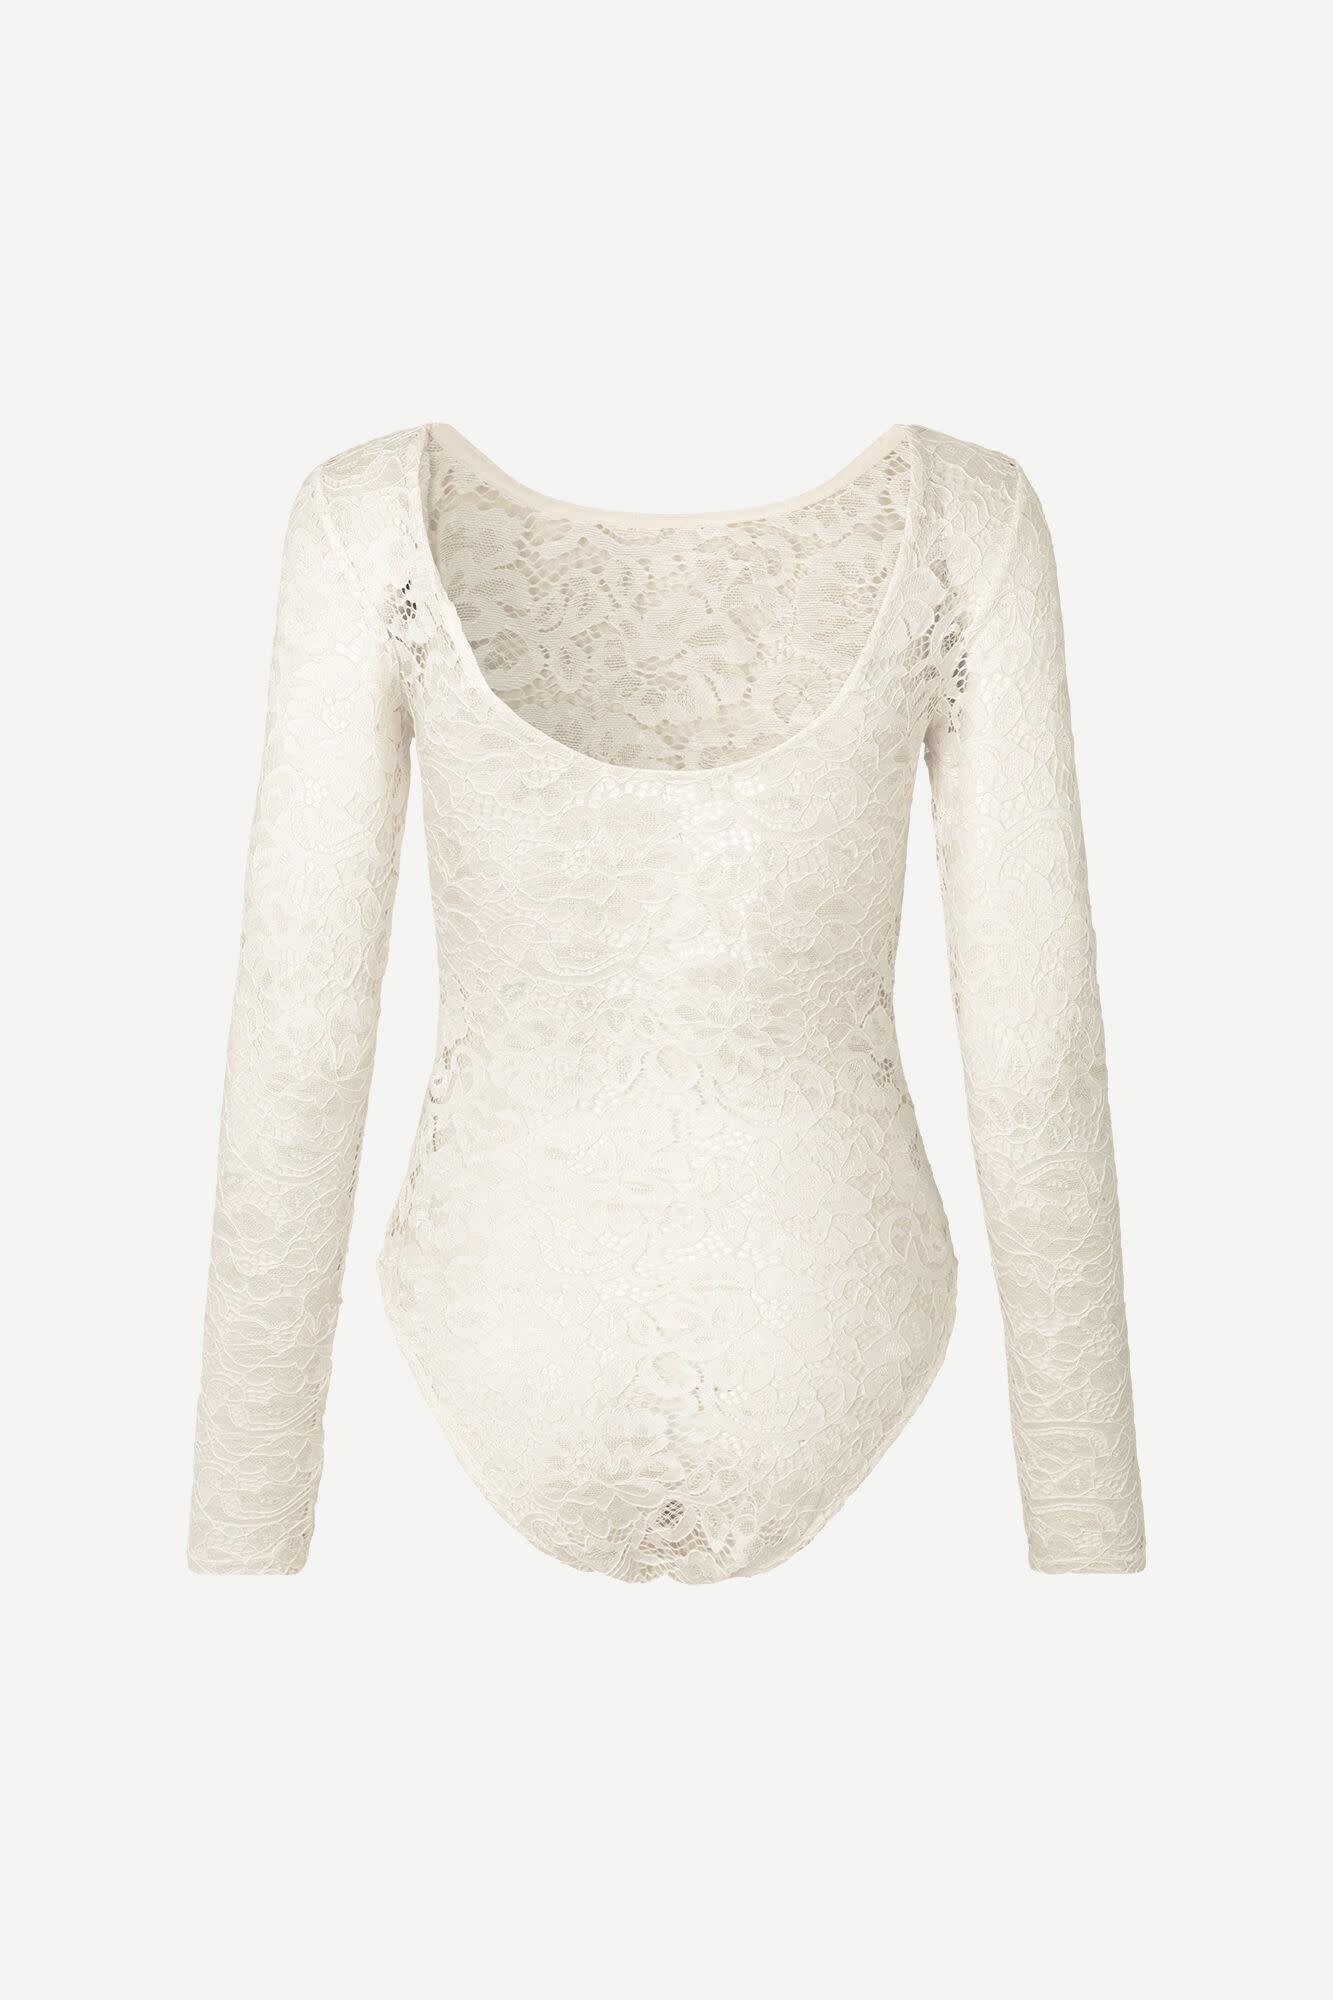 Maalika Lace Body Stocking Ecru White-1